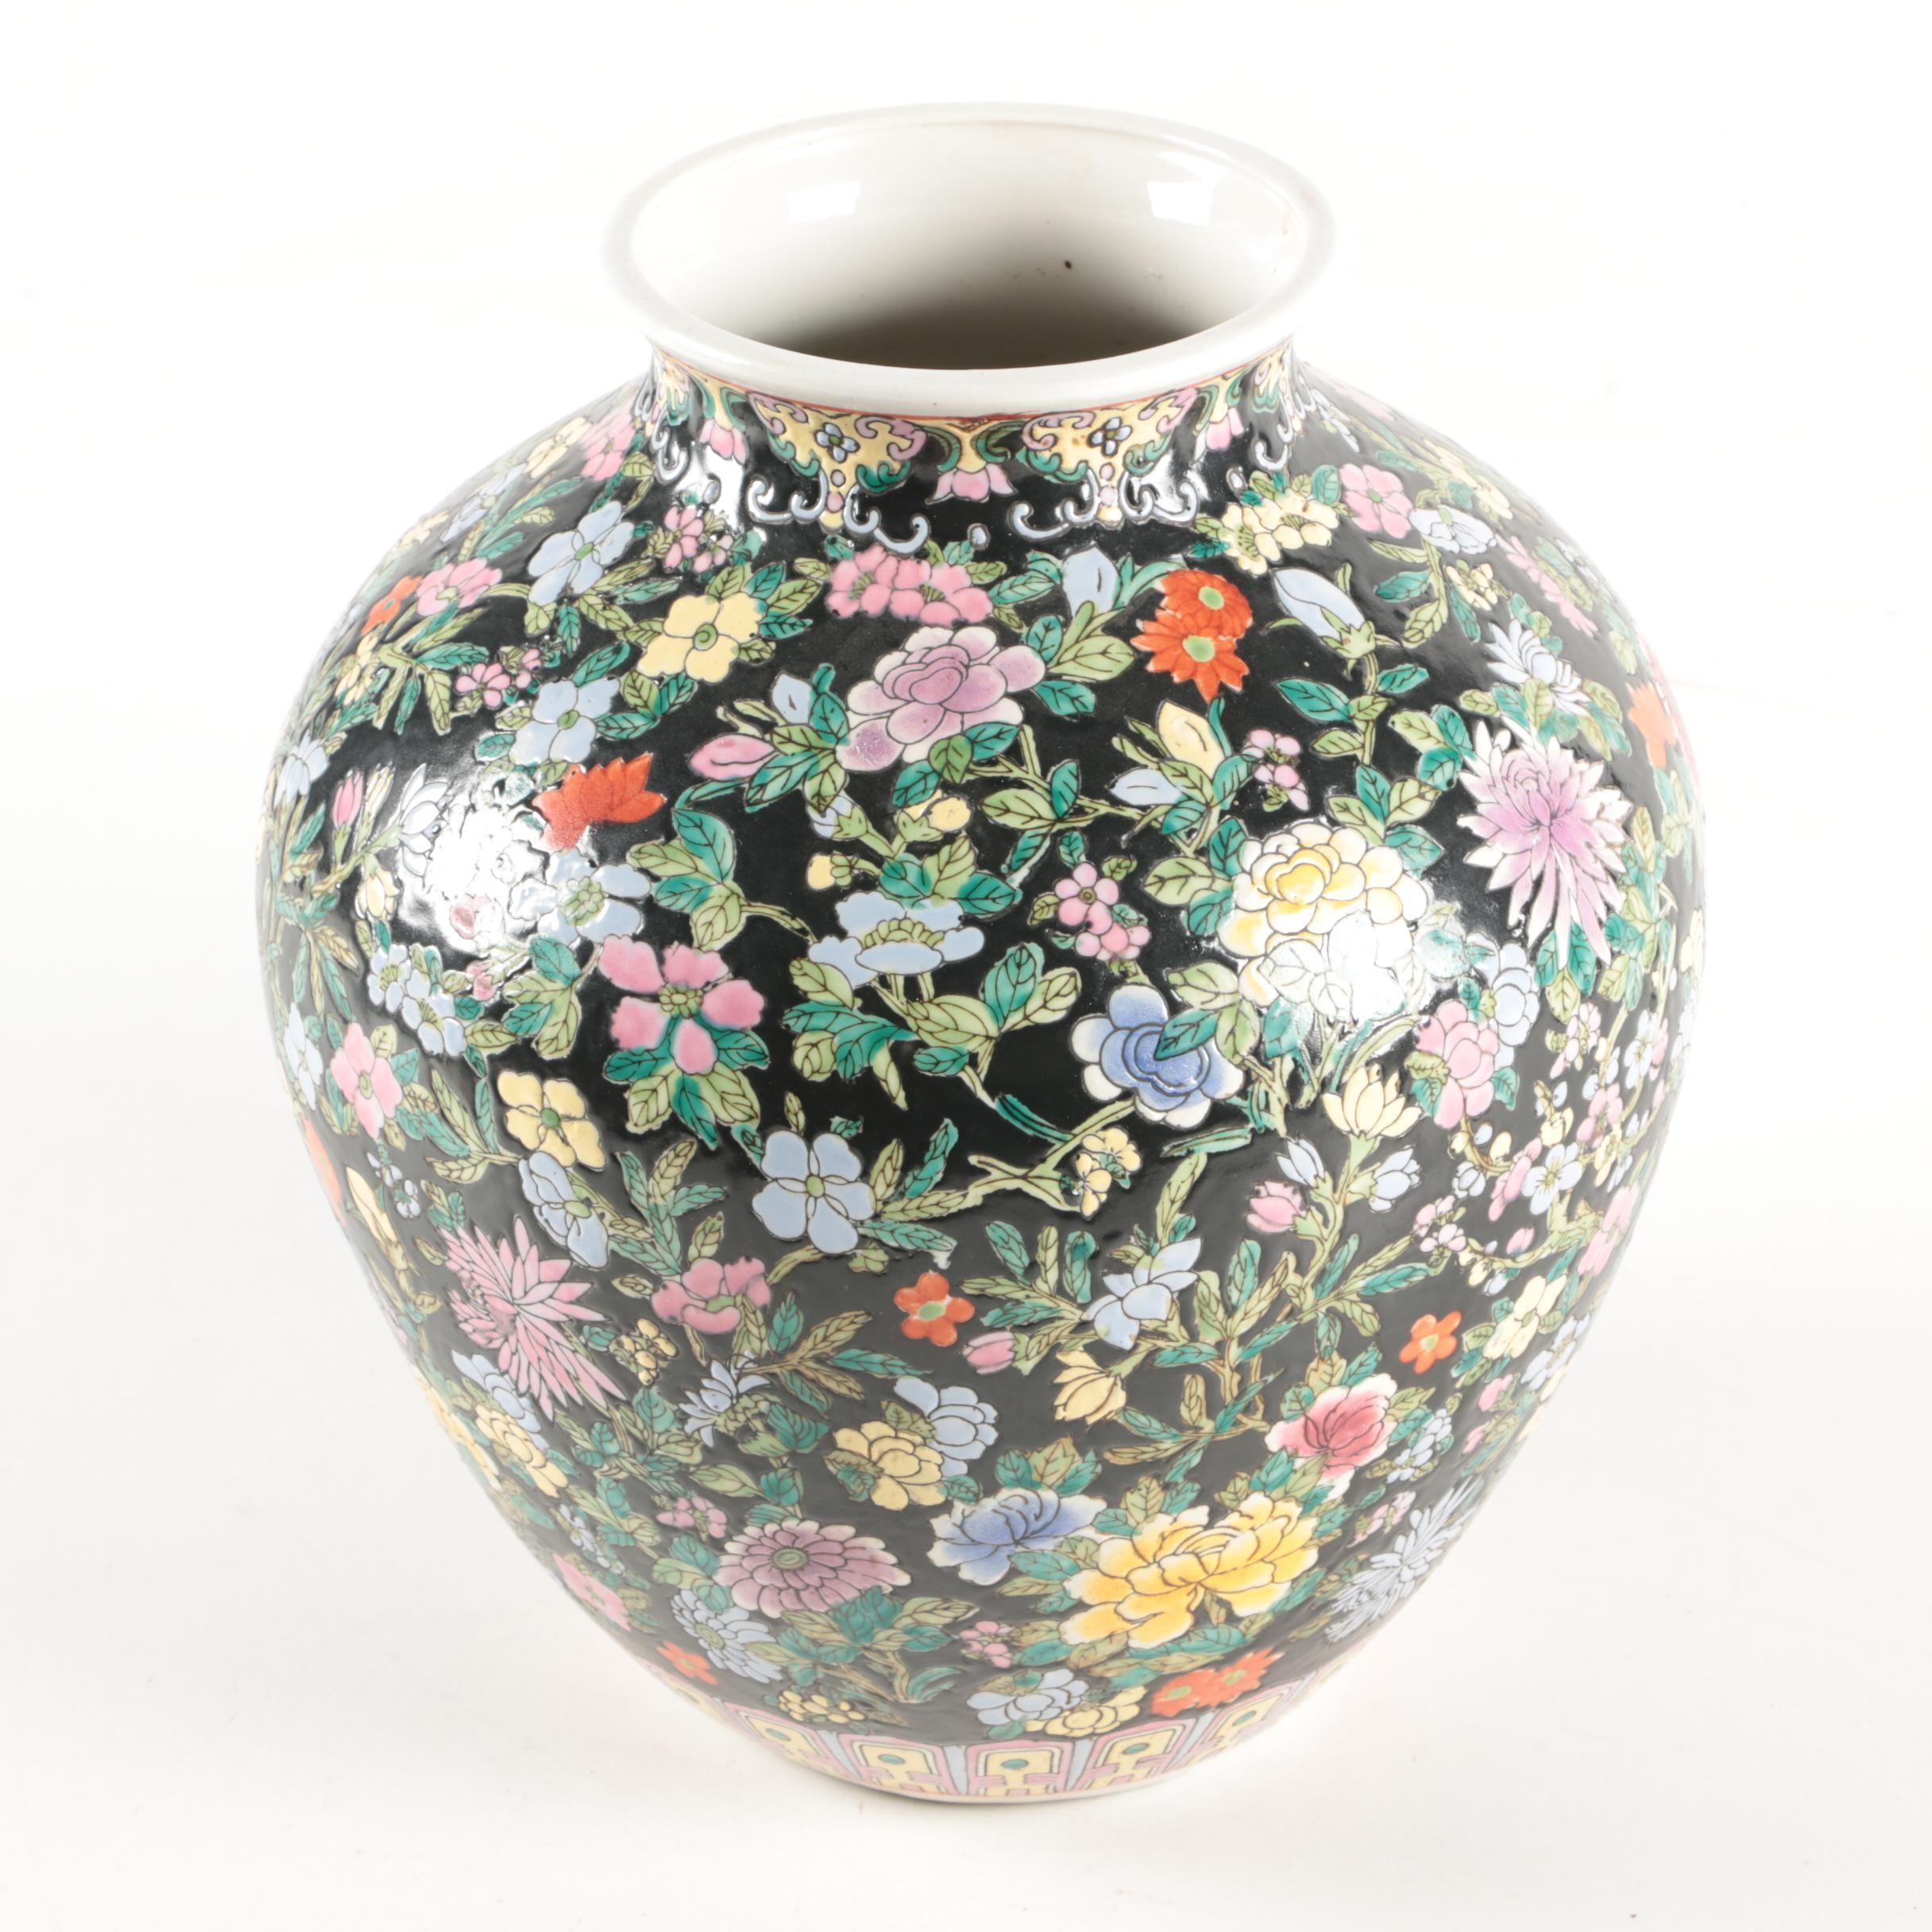 Chinese Ceramic Floral Motif Globular Vase